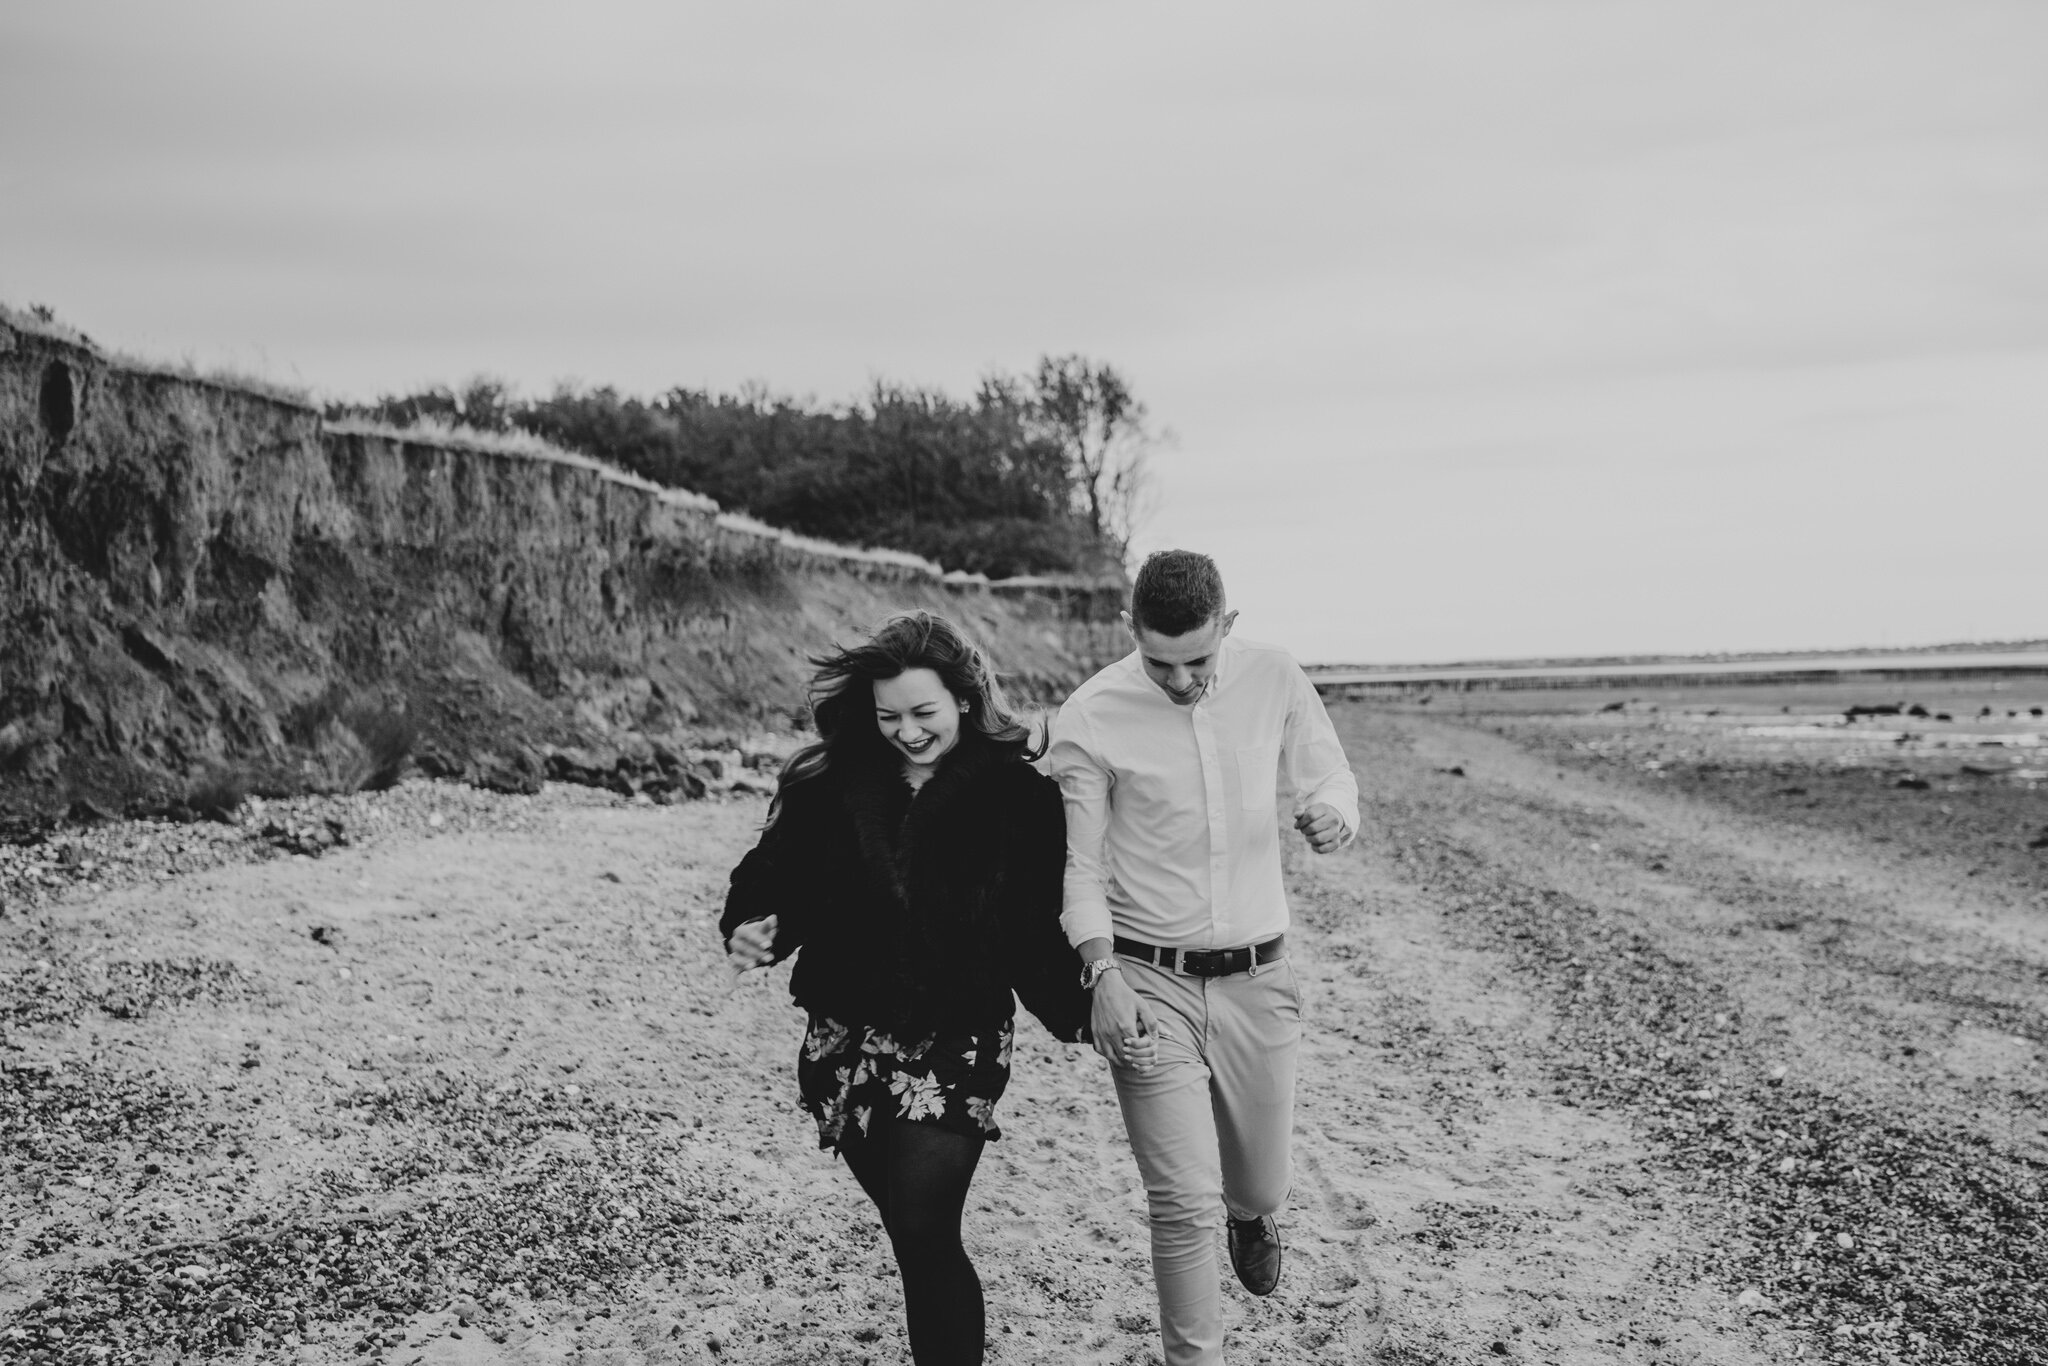 engagement-pre-wedding-hannah-michael-cudmore-grove-east-mersea-grace-elizabeth-colchester-essex-devon-suffolk-and-norfolk-alternative-wedding-and-family-photographer (35 of 51).jpg